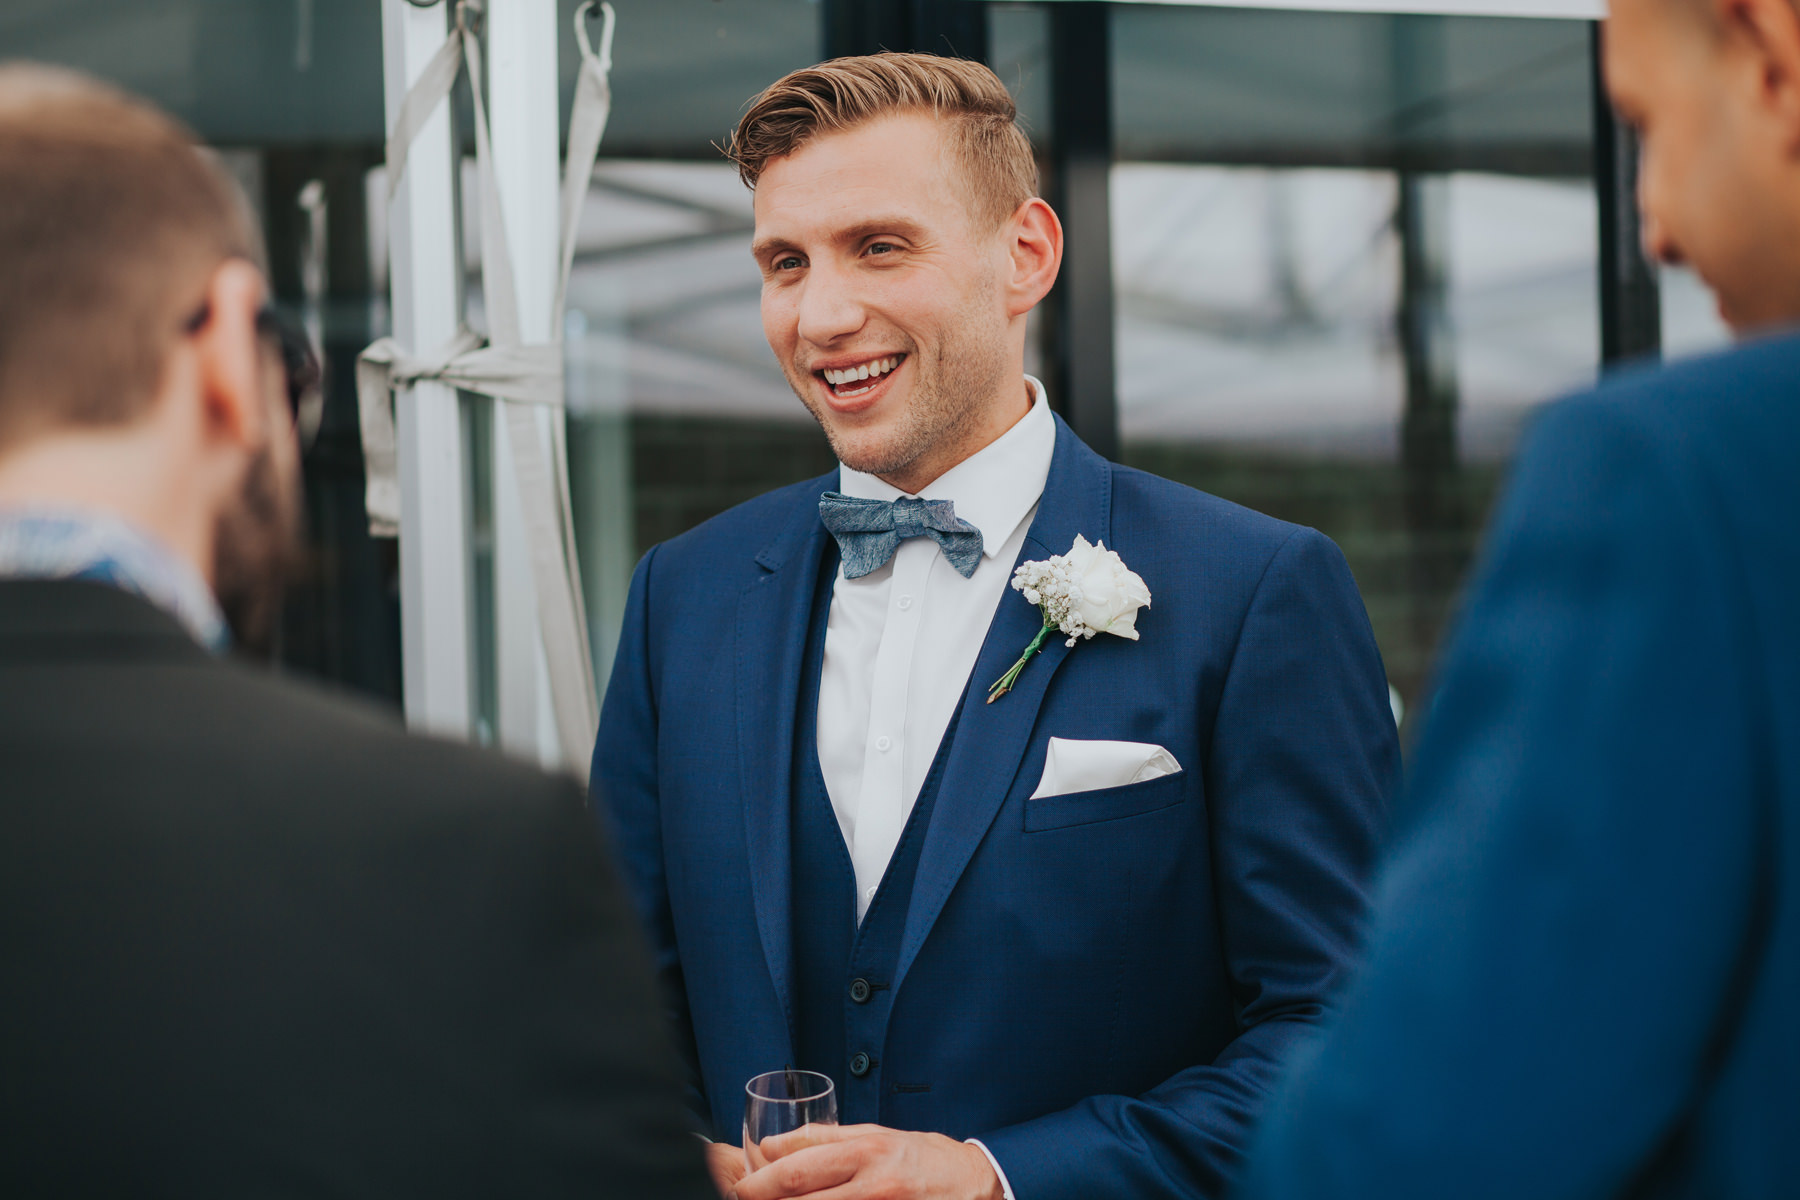 CRL-281-The Bingham wedding Richmond-reportage guest candid photographer.jpg